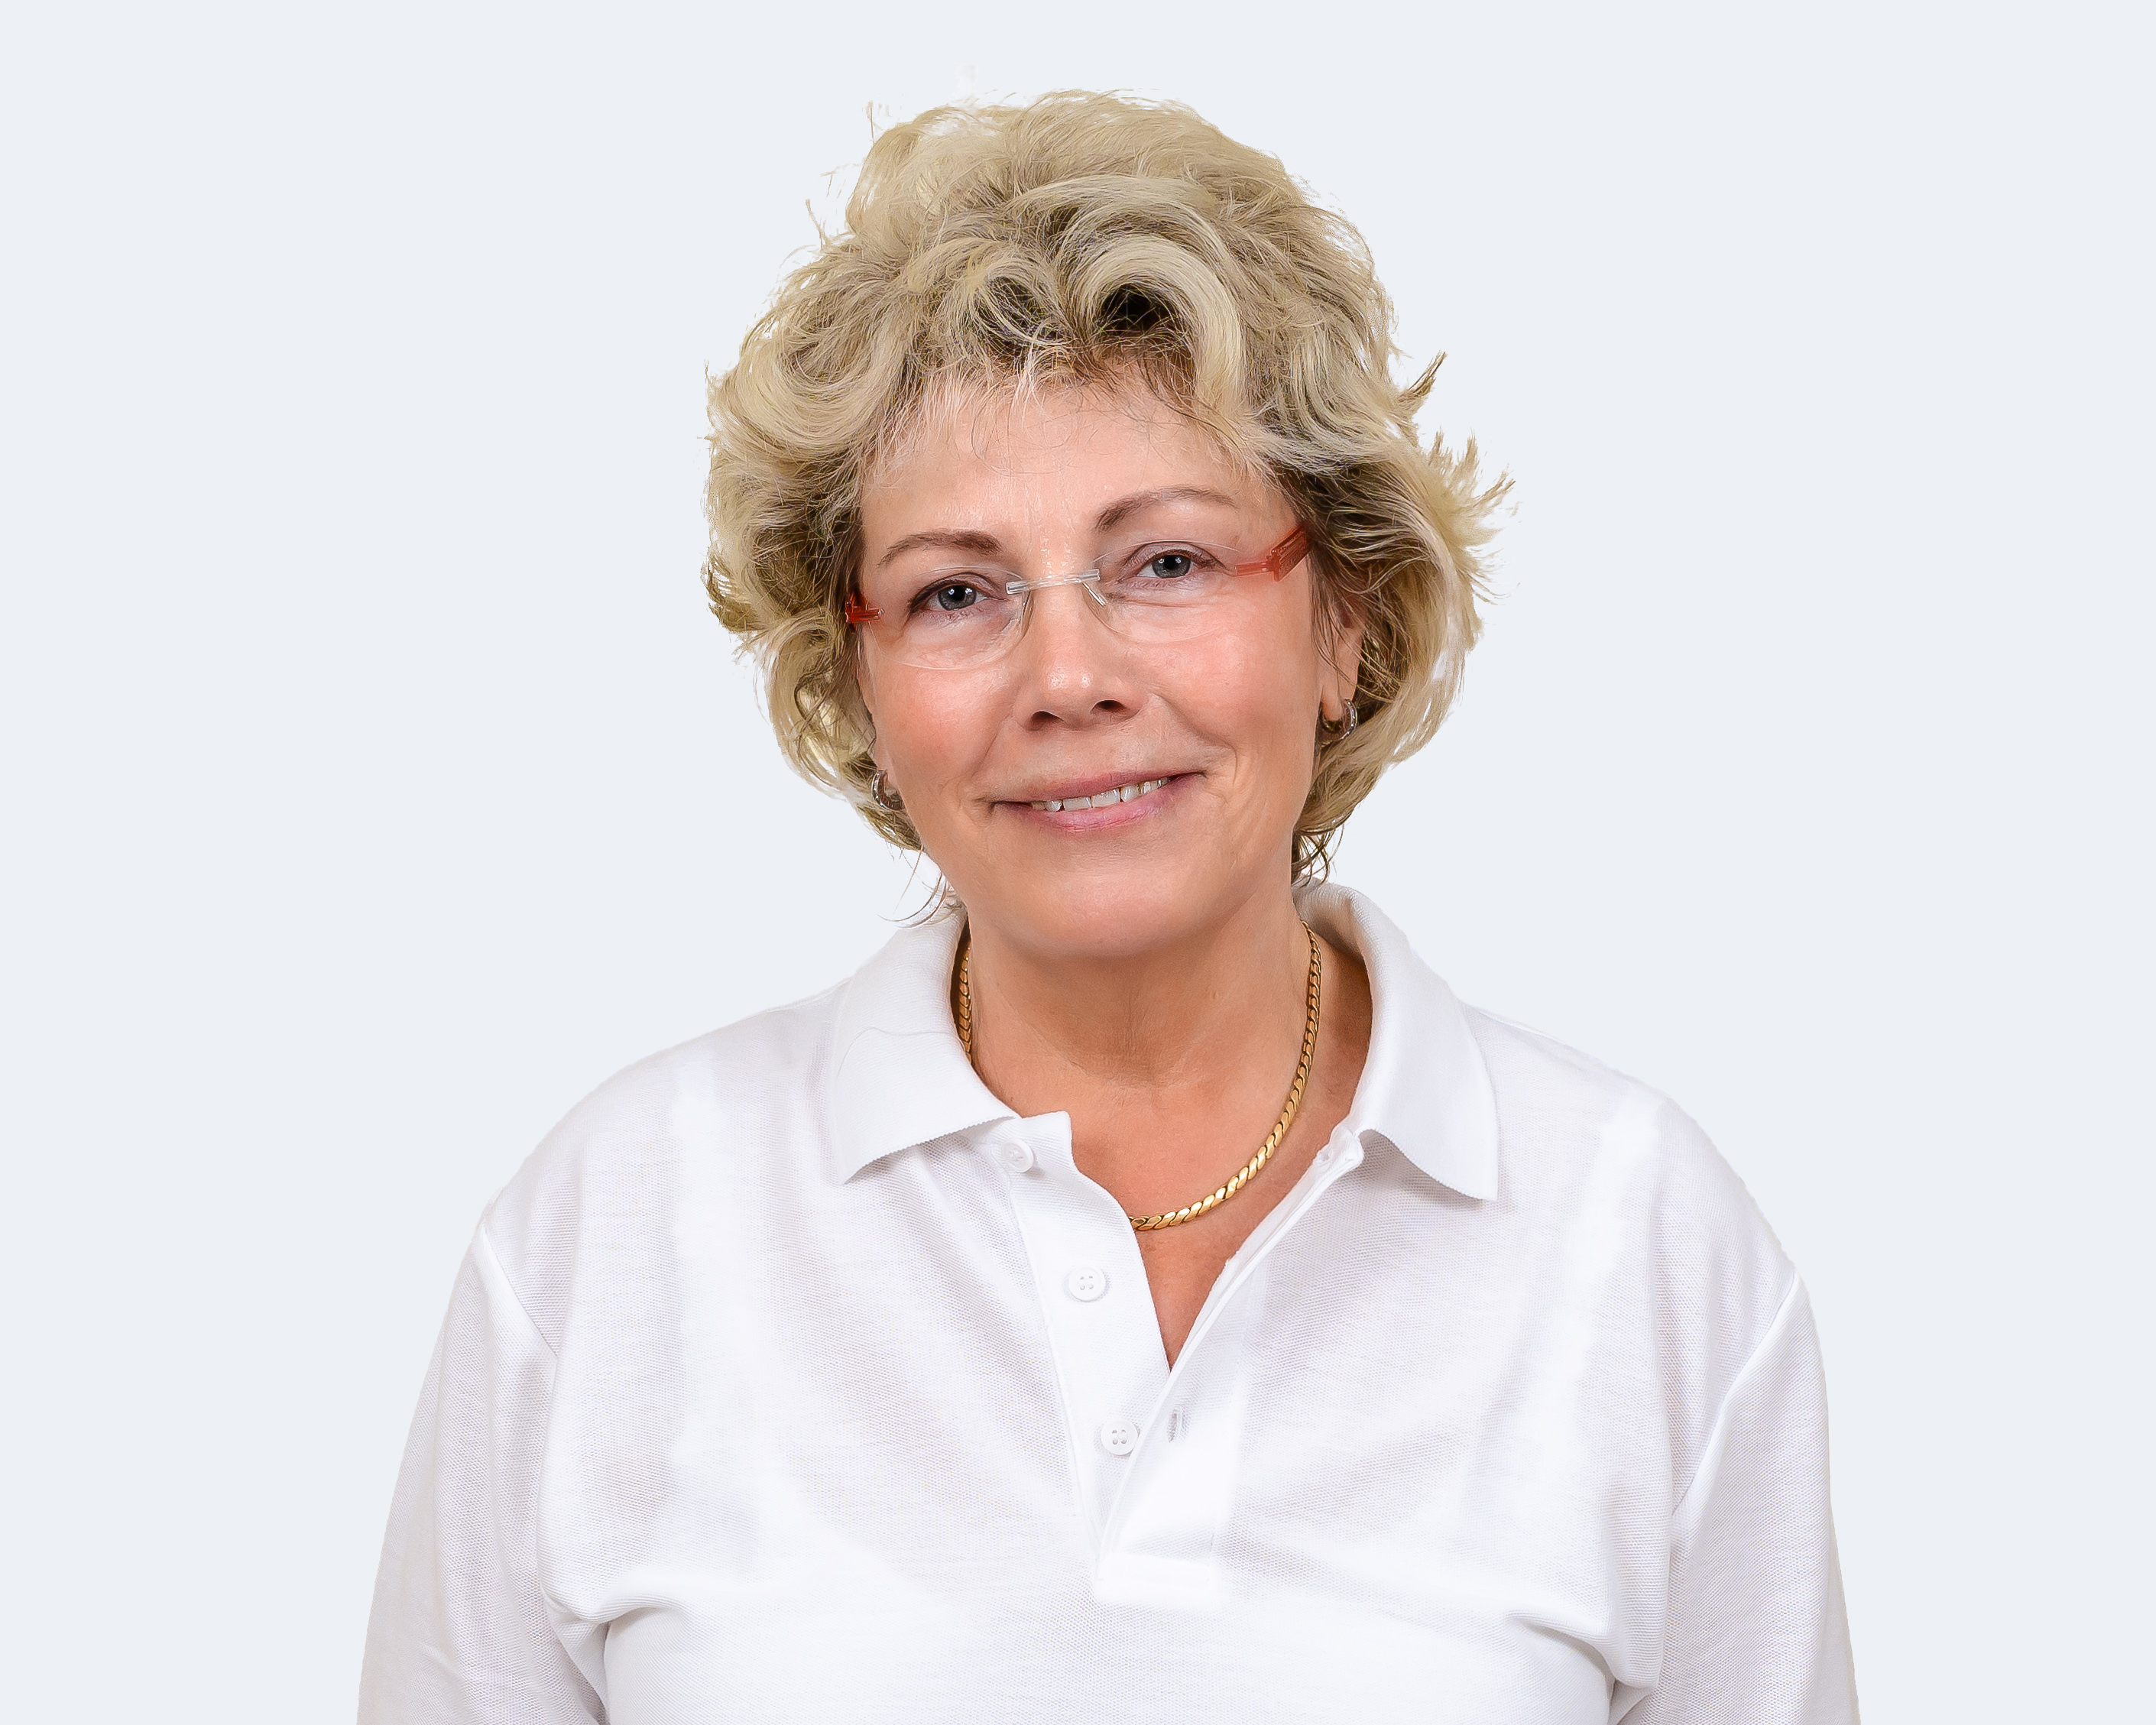 Barbara Riedel